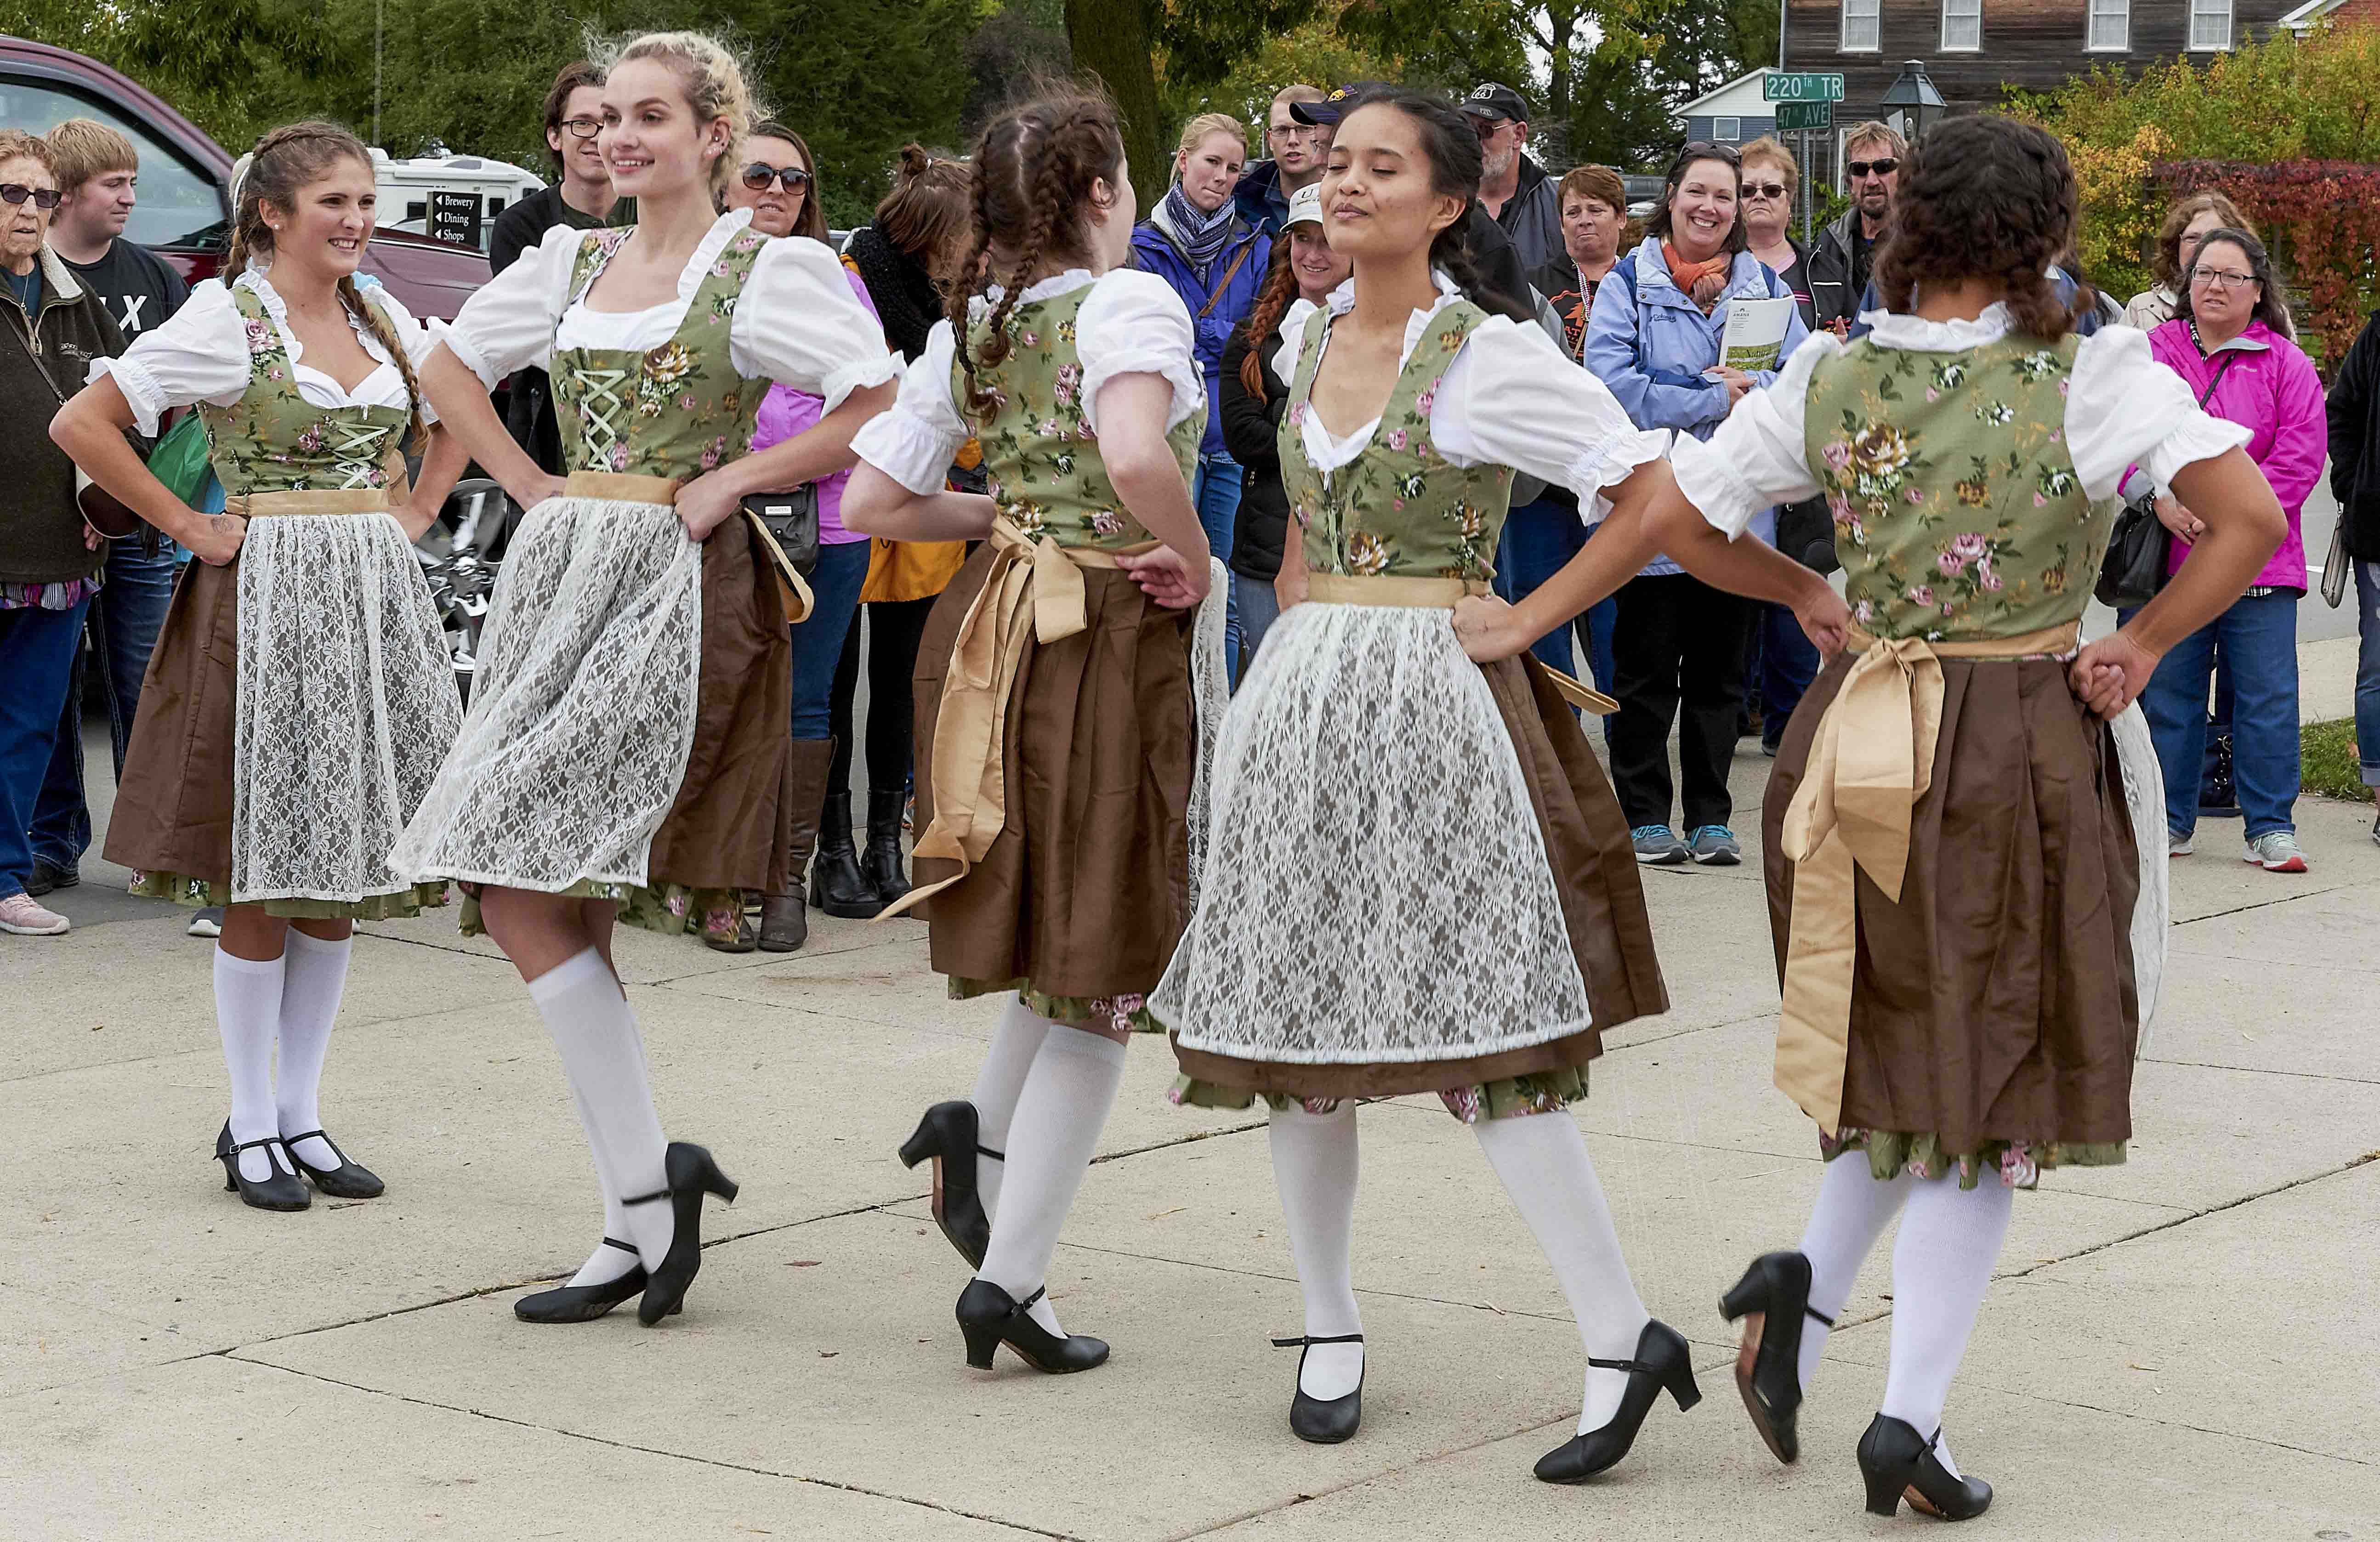 Amana Colonie Dancers dressed in traditional German Dirndl dresses